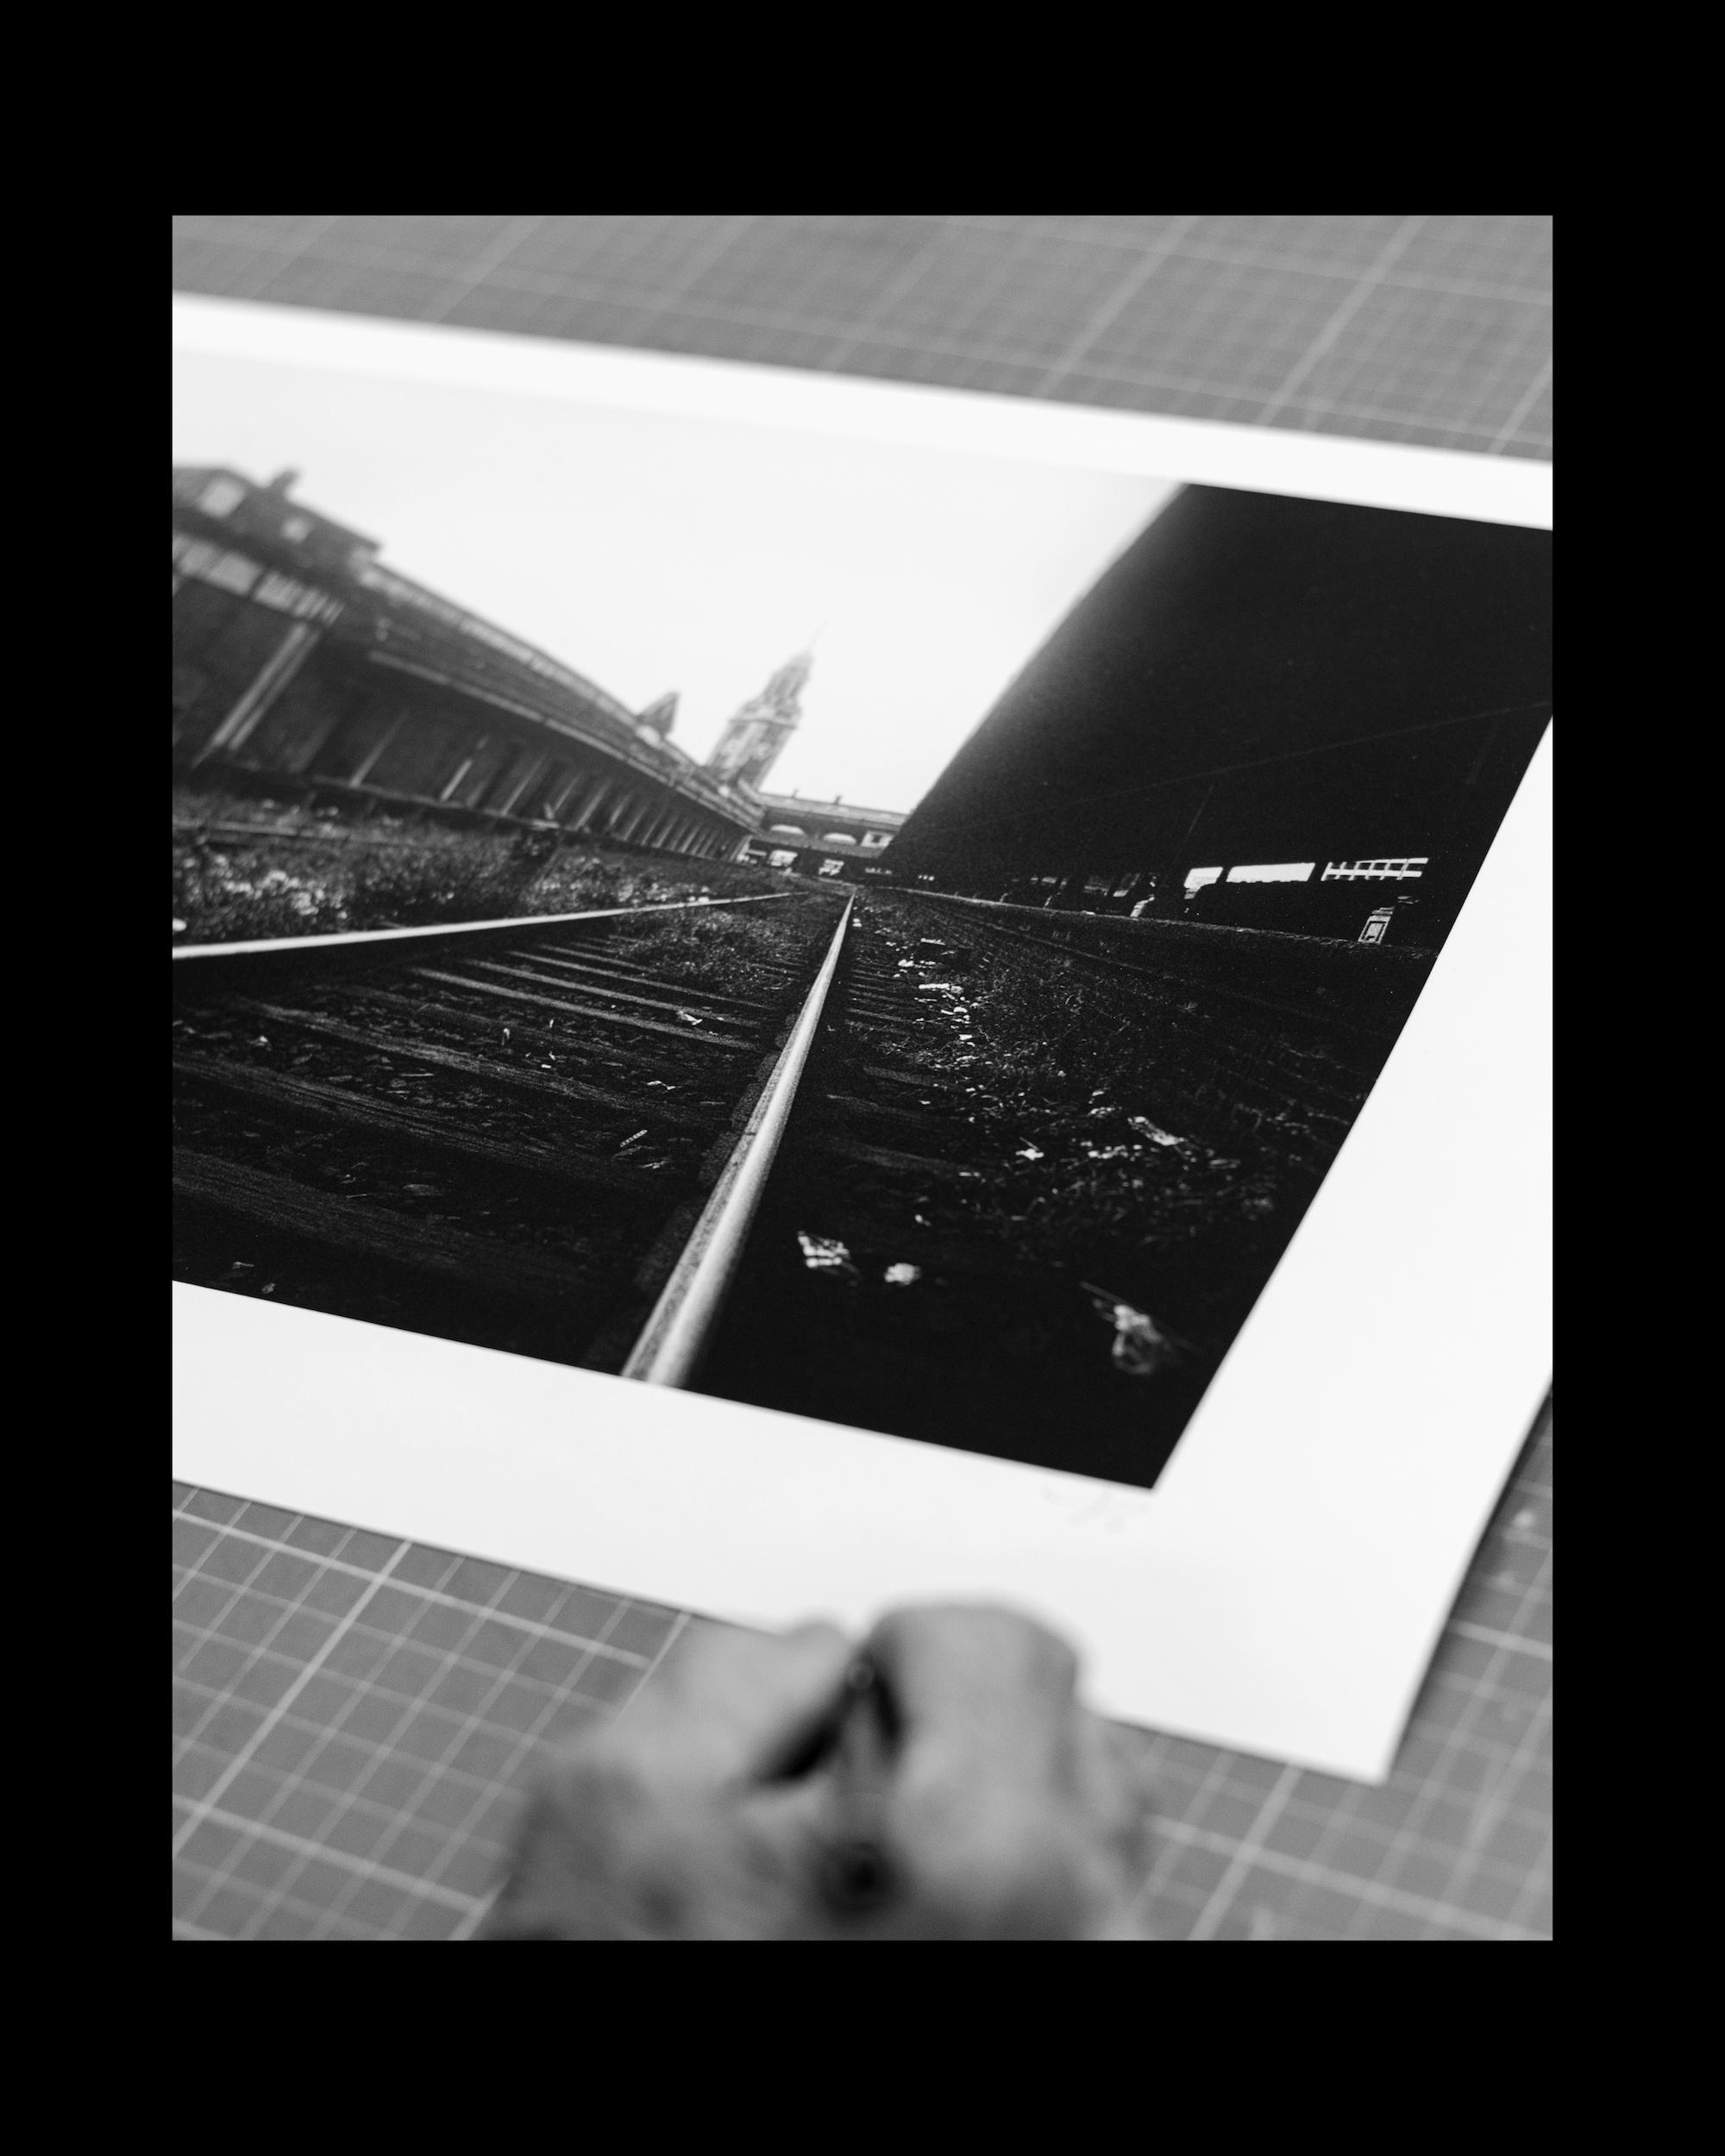 翁維銓在於其作品《總站・終結》上簽名。Peter Yung signing print,  The Termination